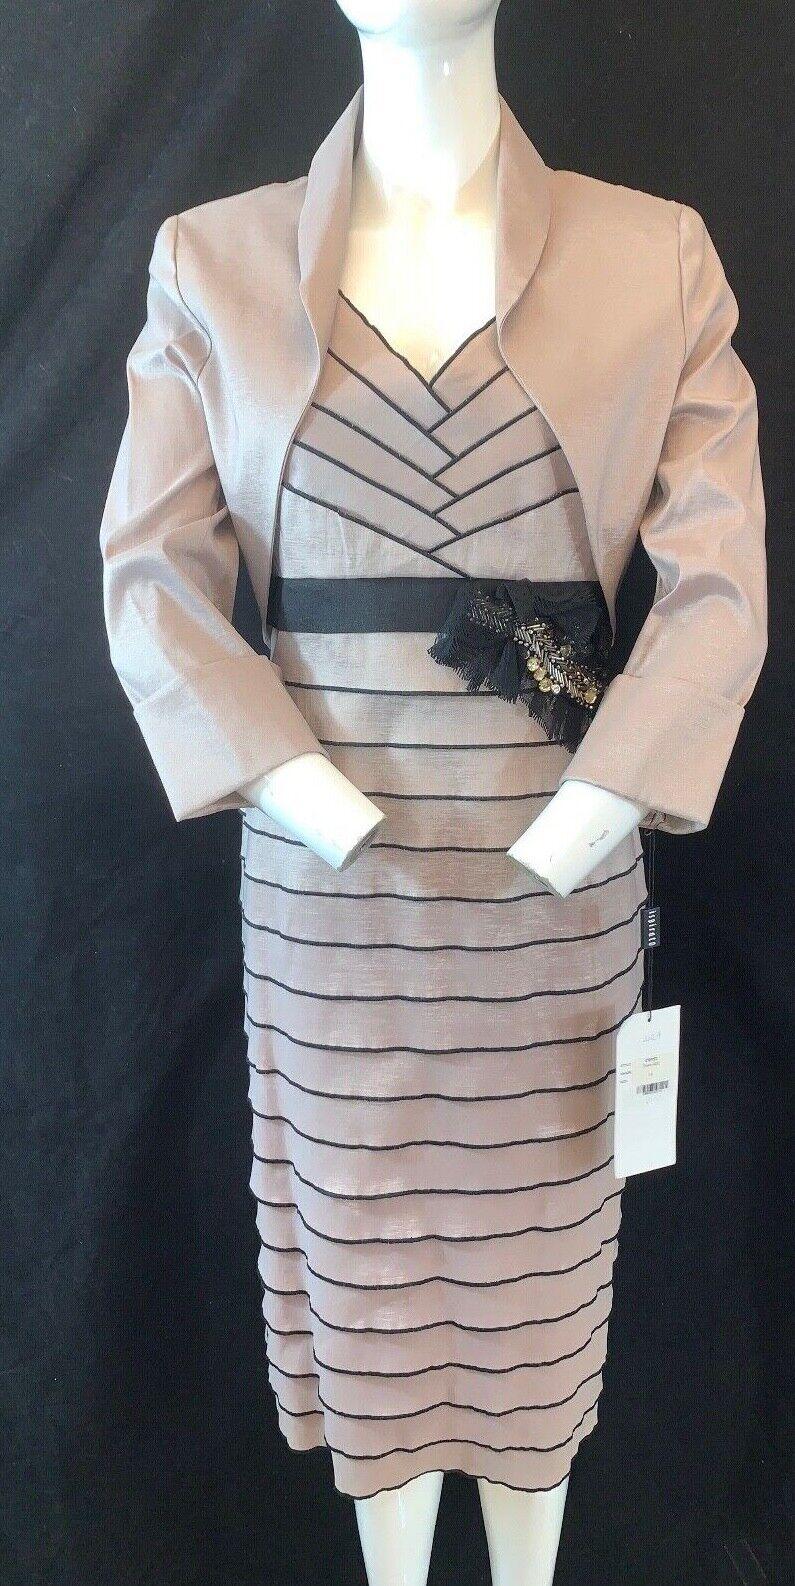 BNWT Ispirato IM 952 Bandage Dress and Bolero DuneJacket. Mother Bride/Groom 14